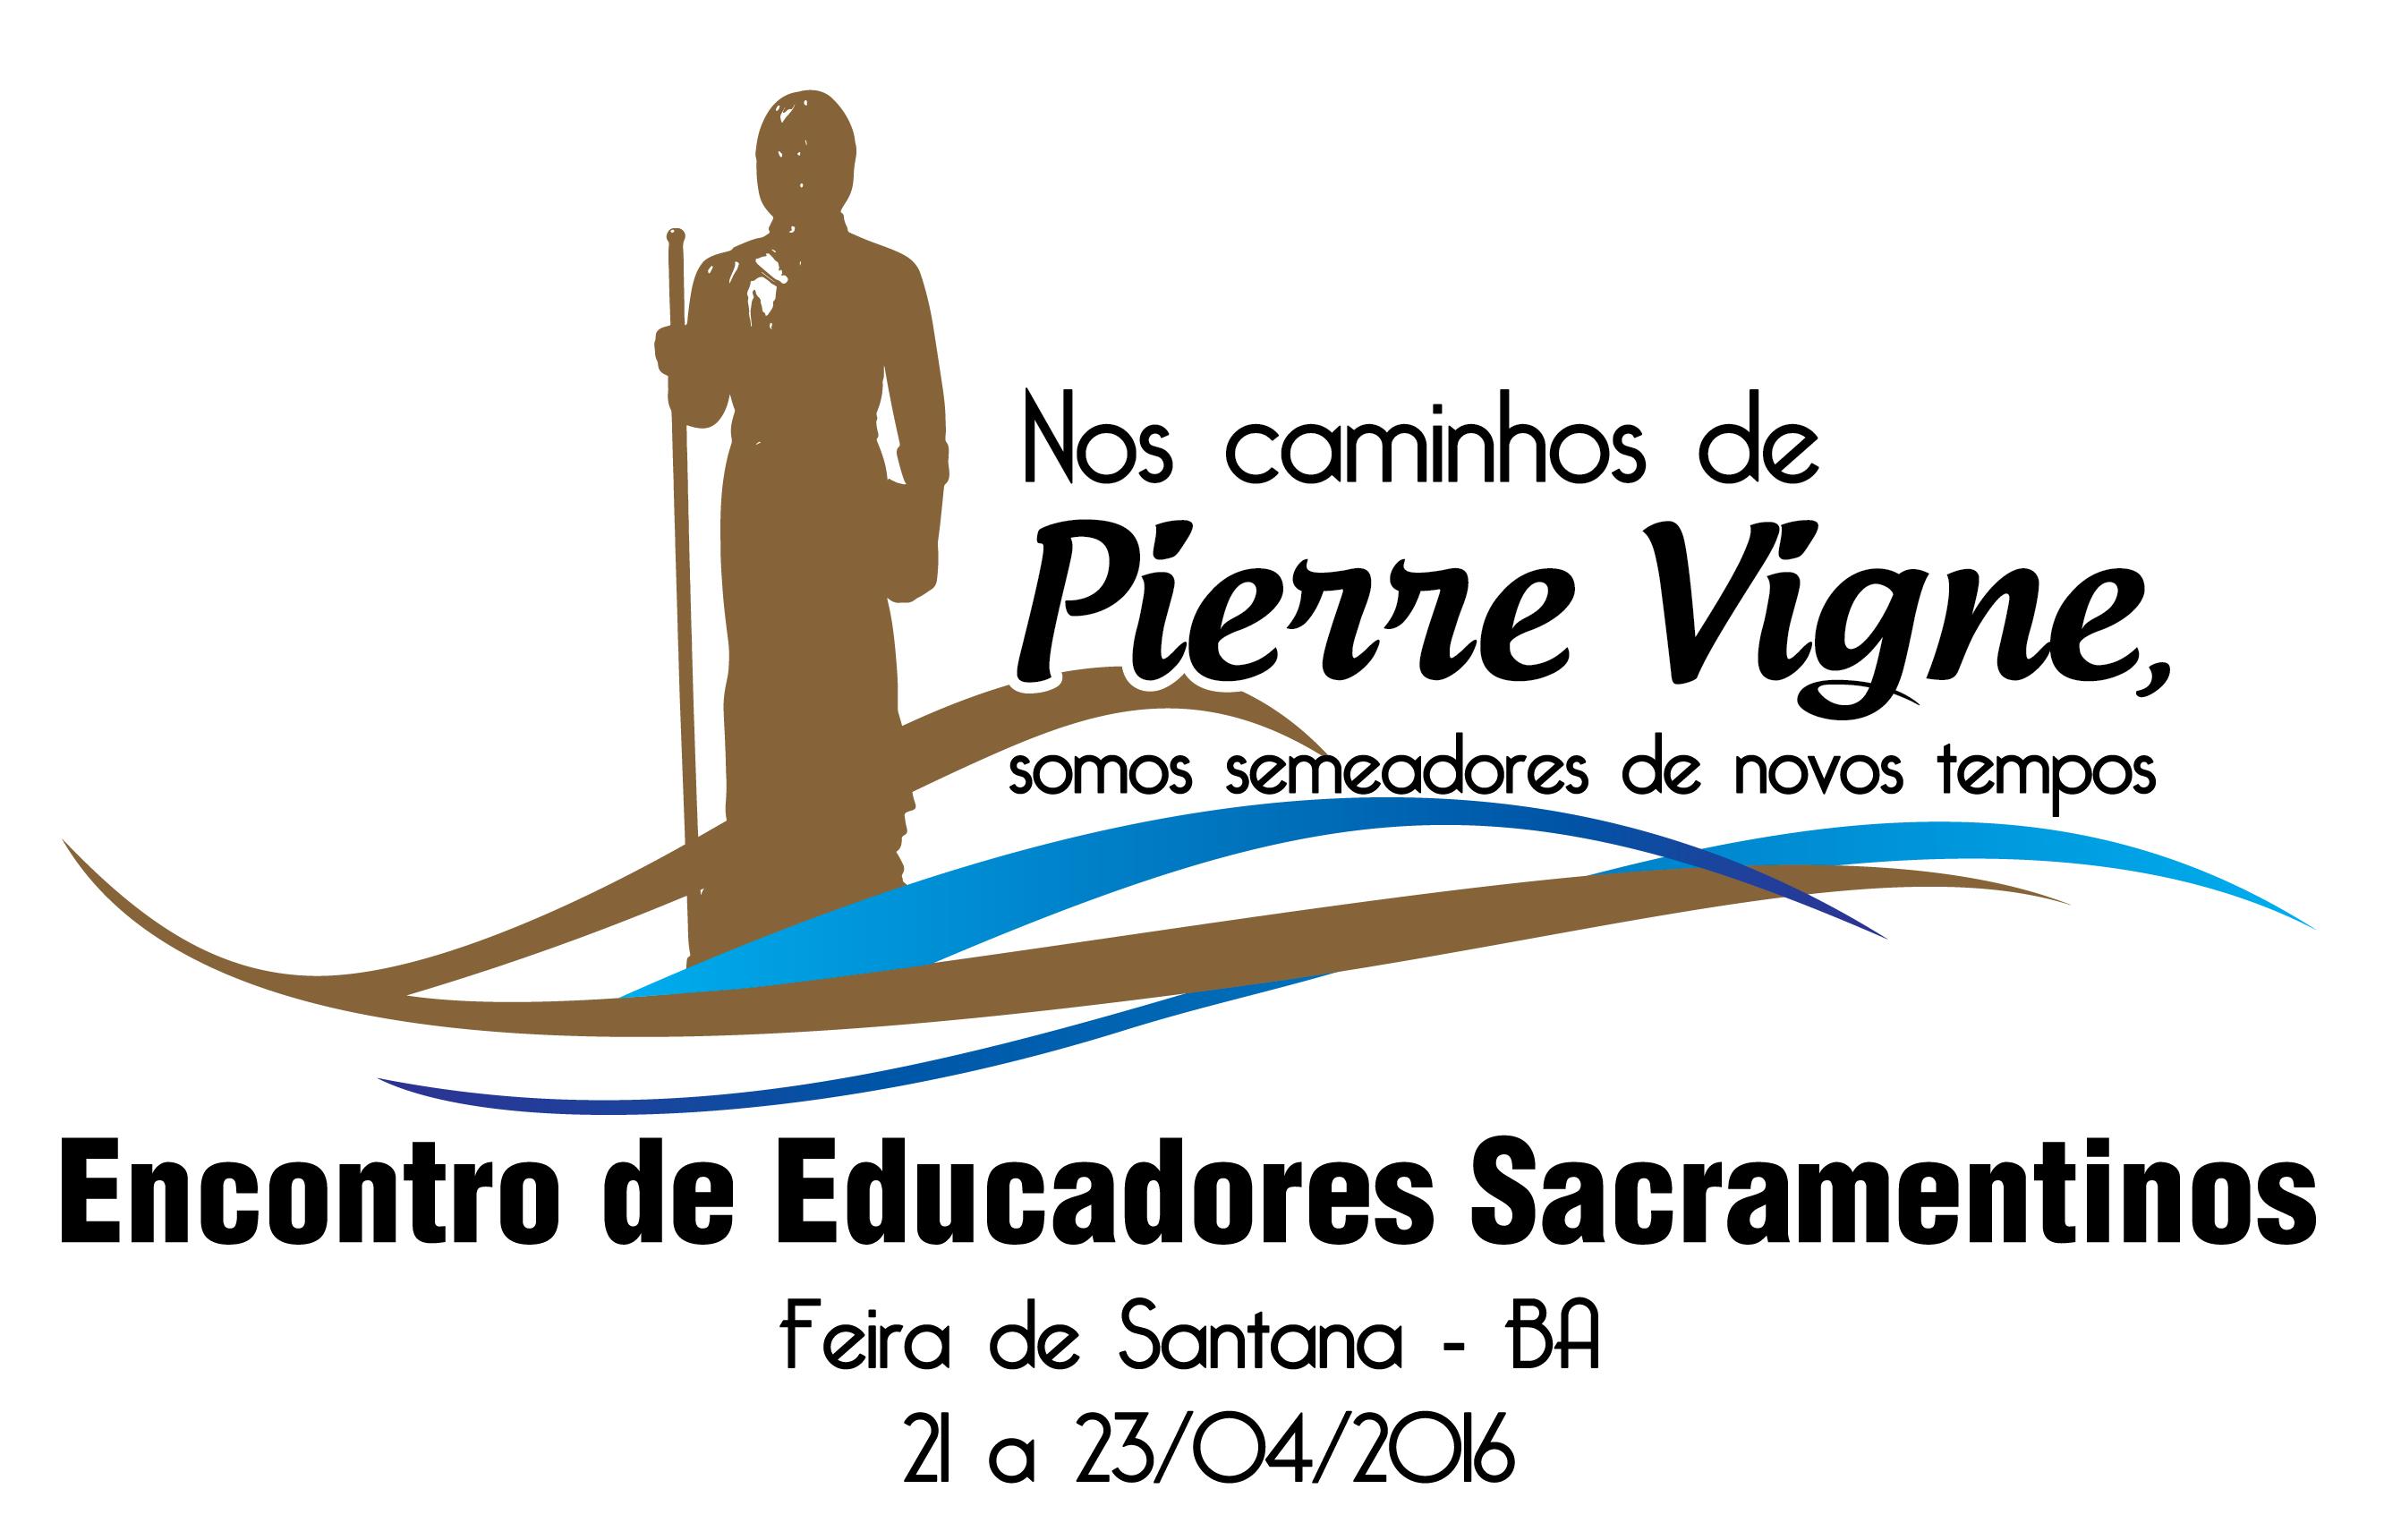 Encontro de Educadores Sacramentinos - logo